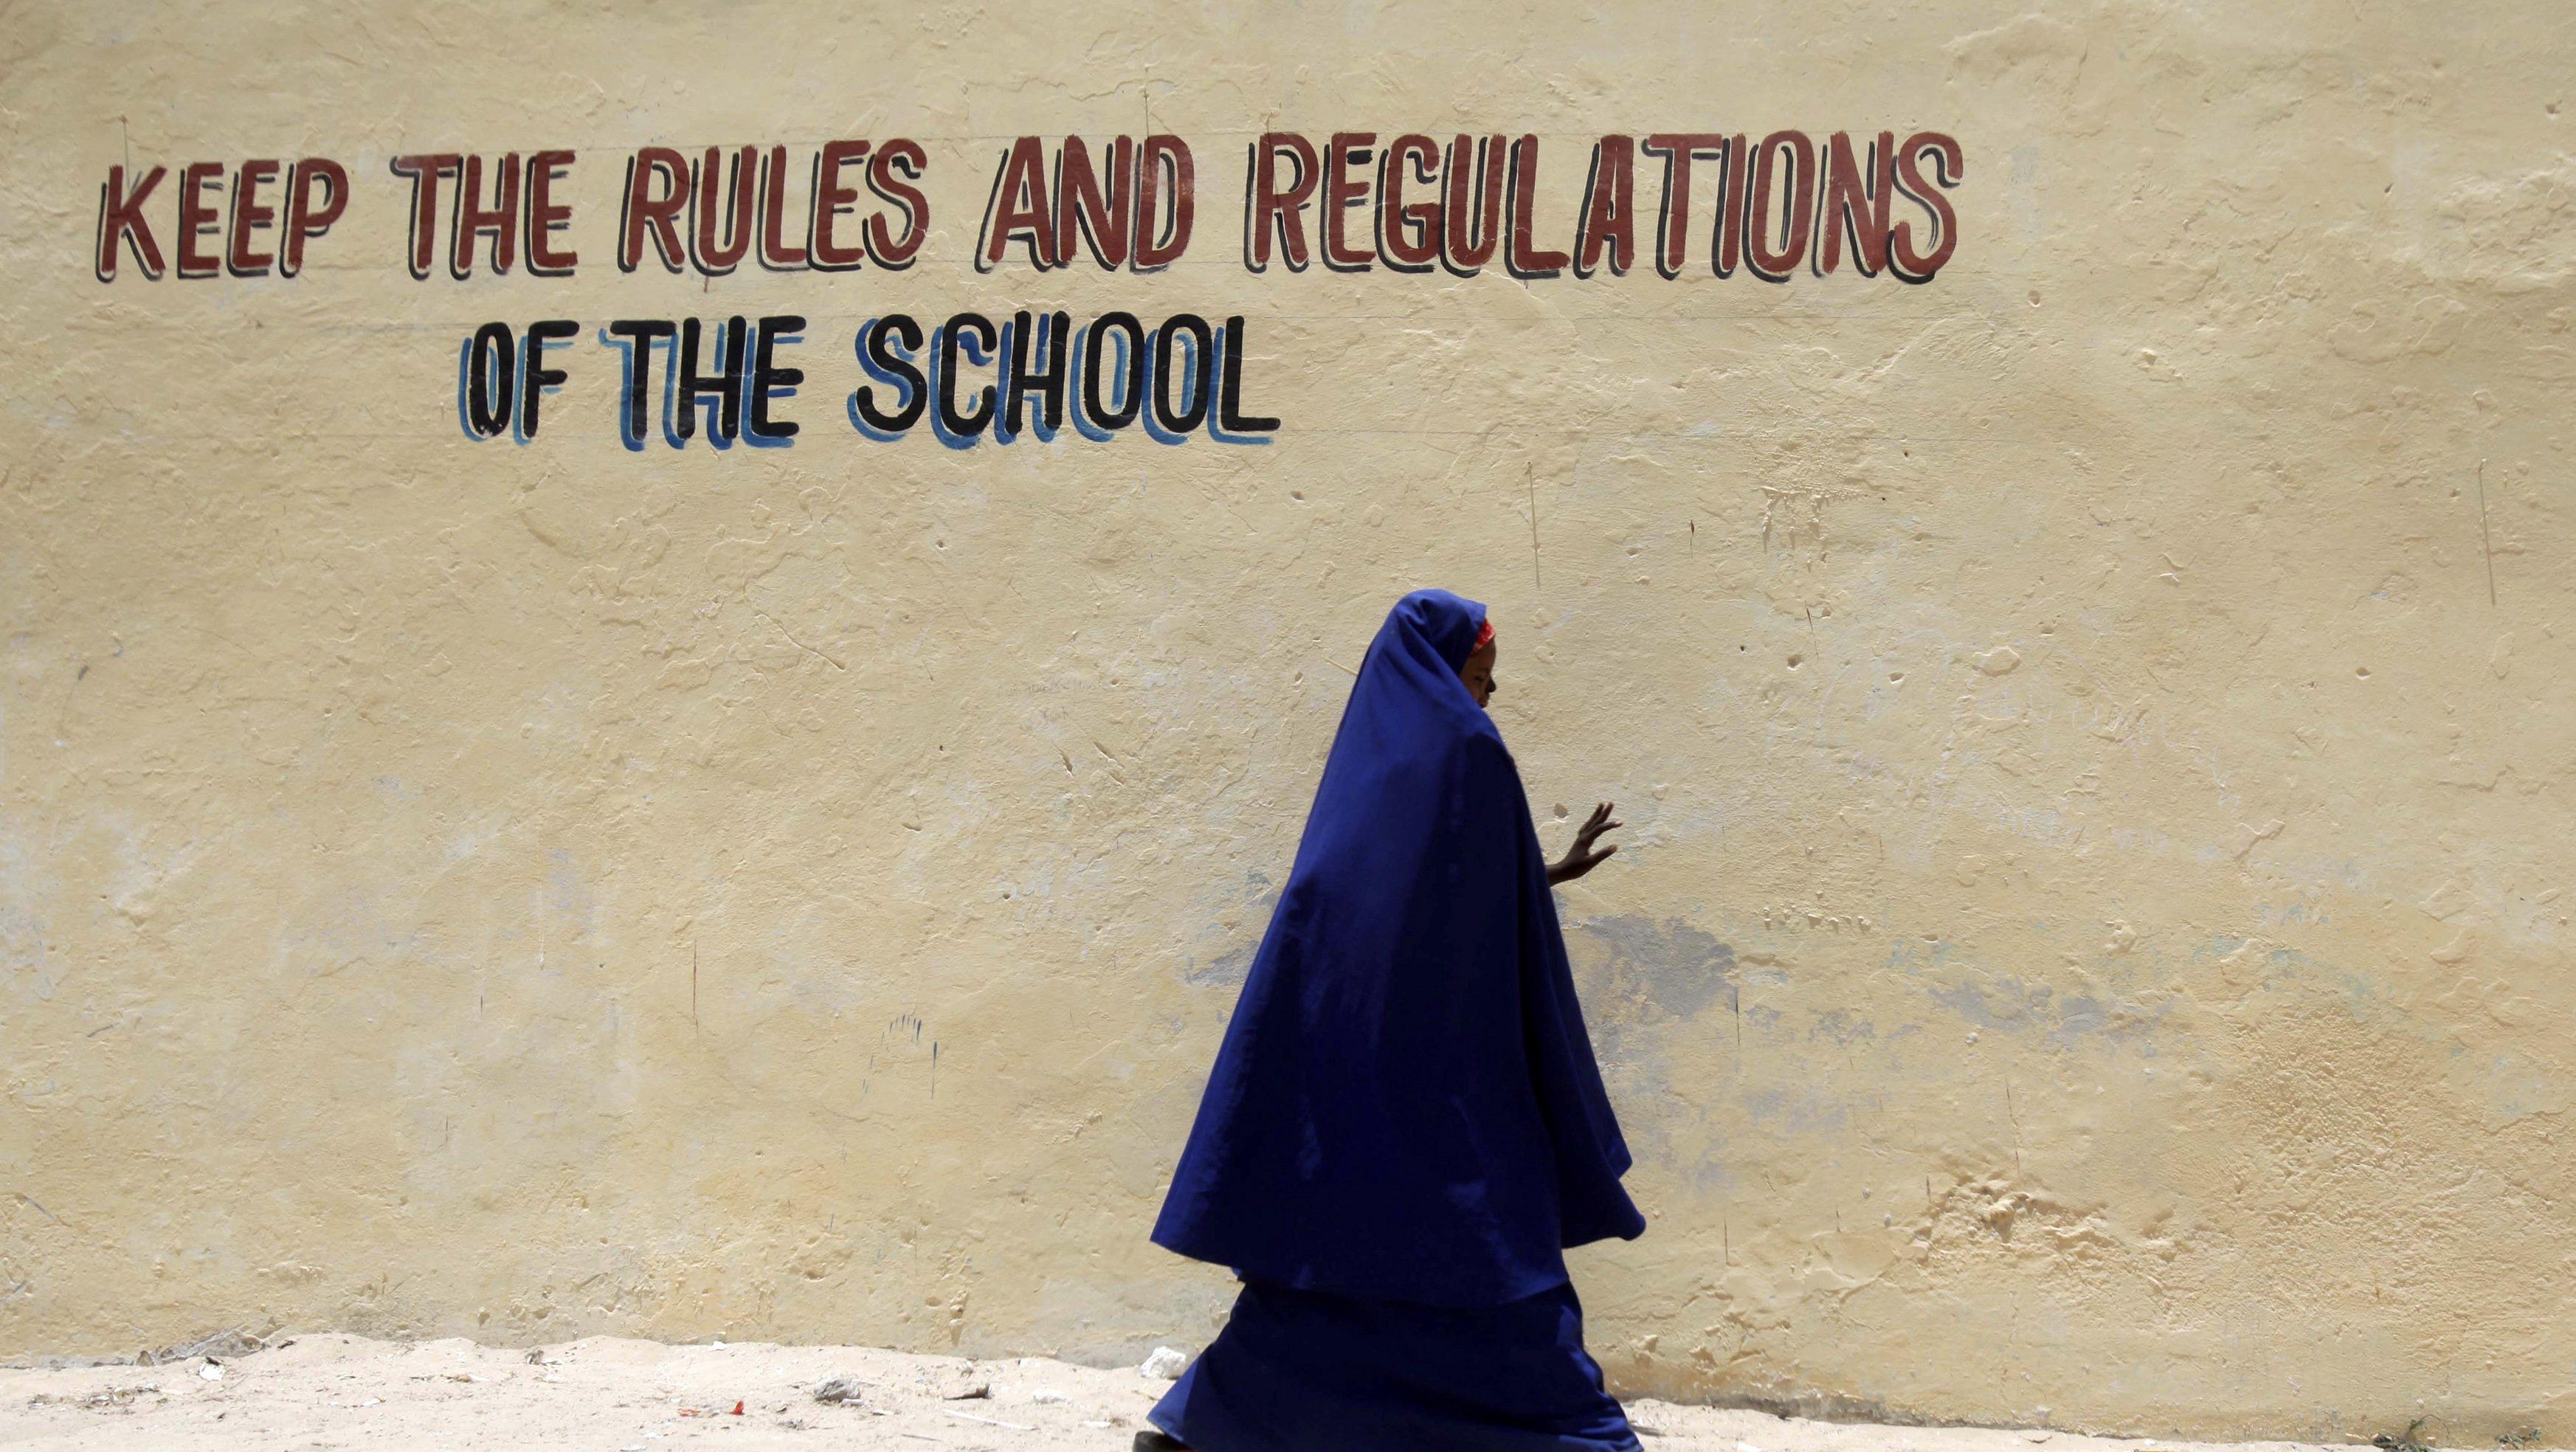 Somalia to block social media during high school exams